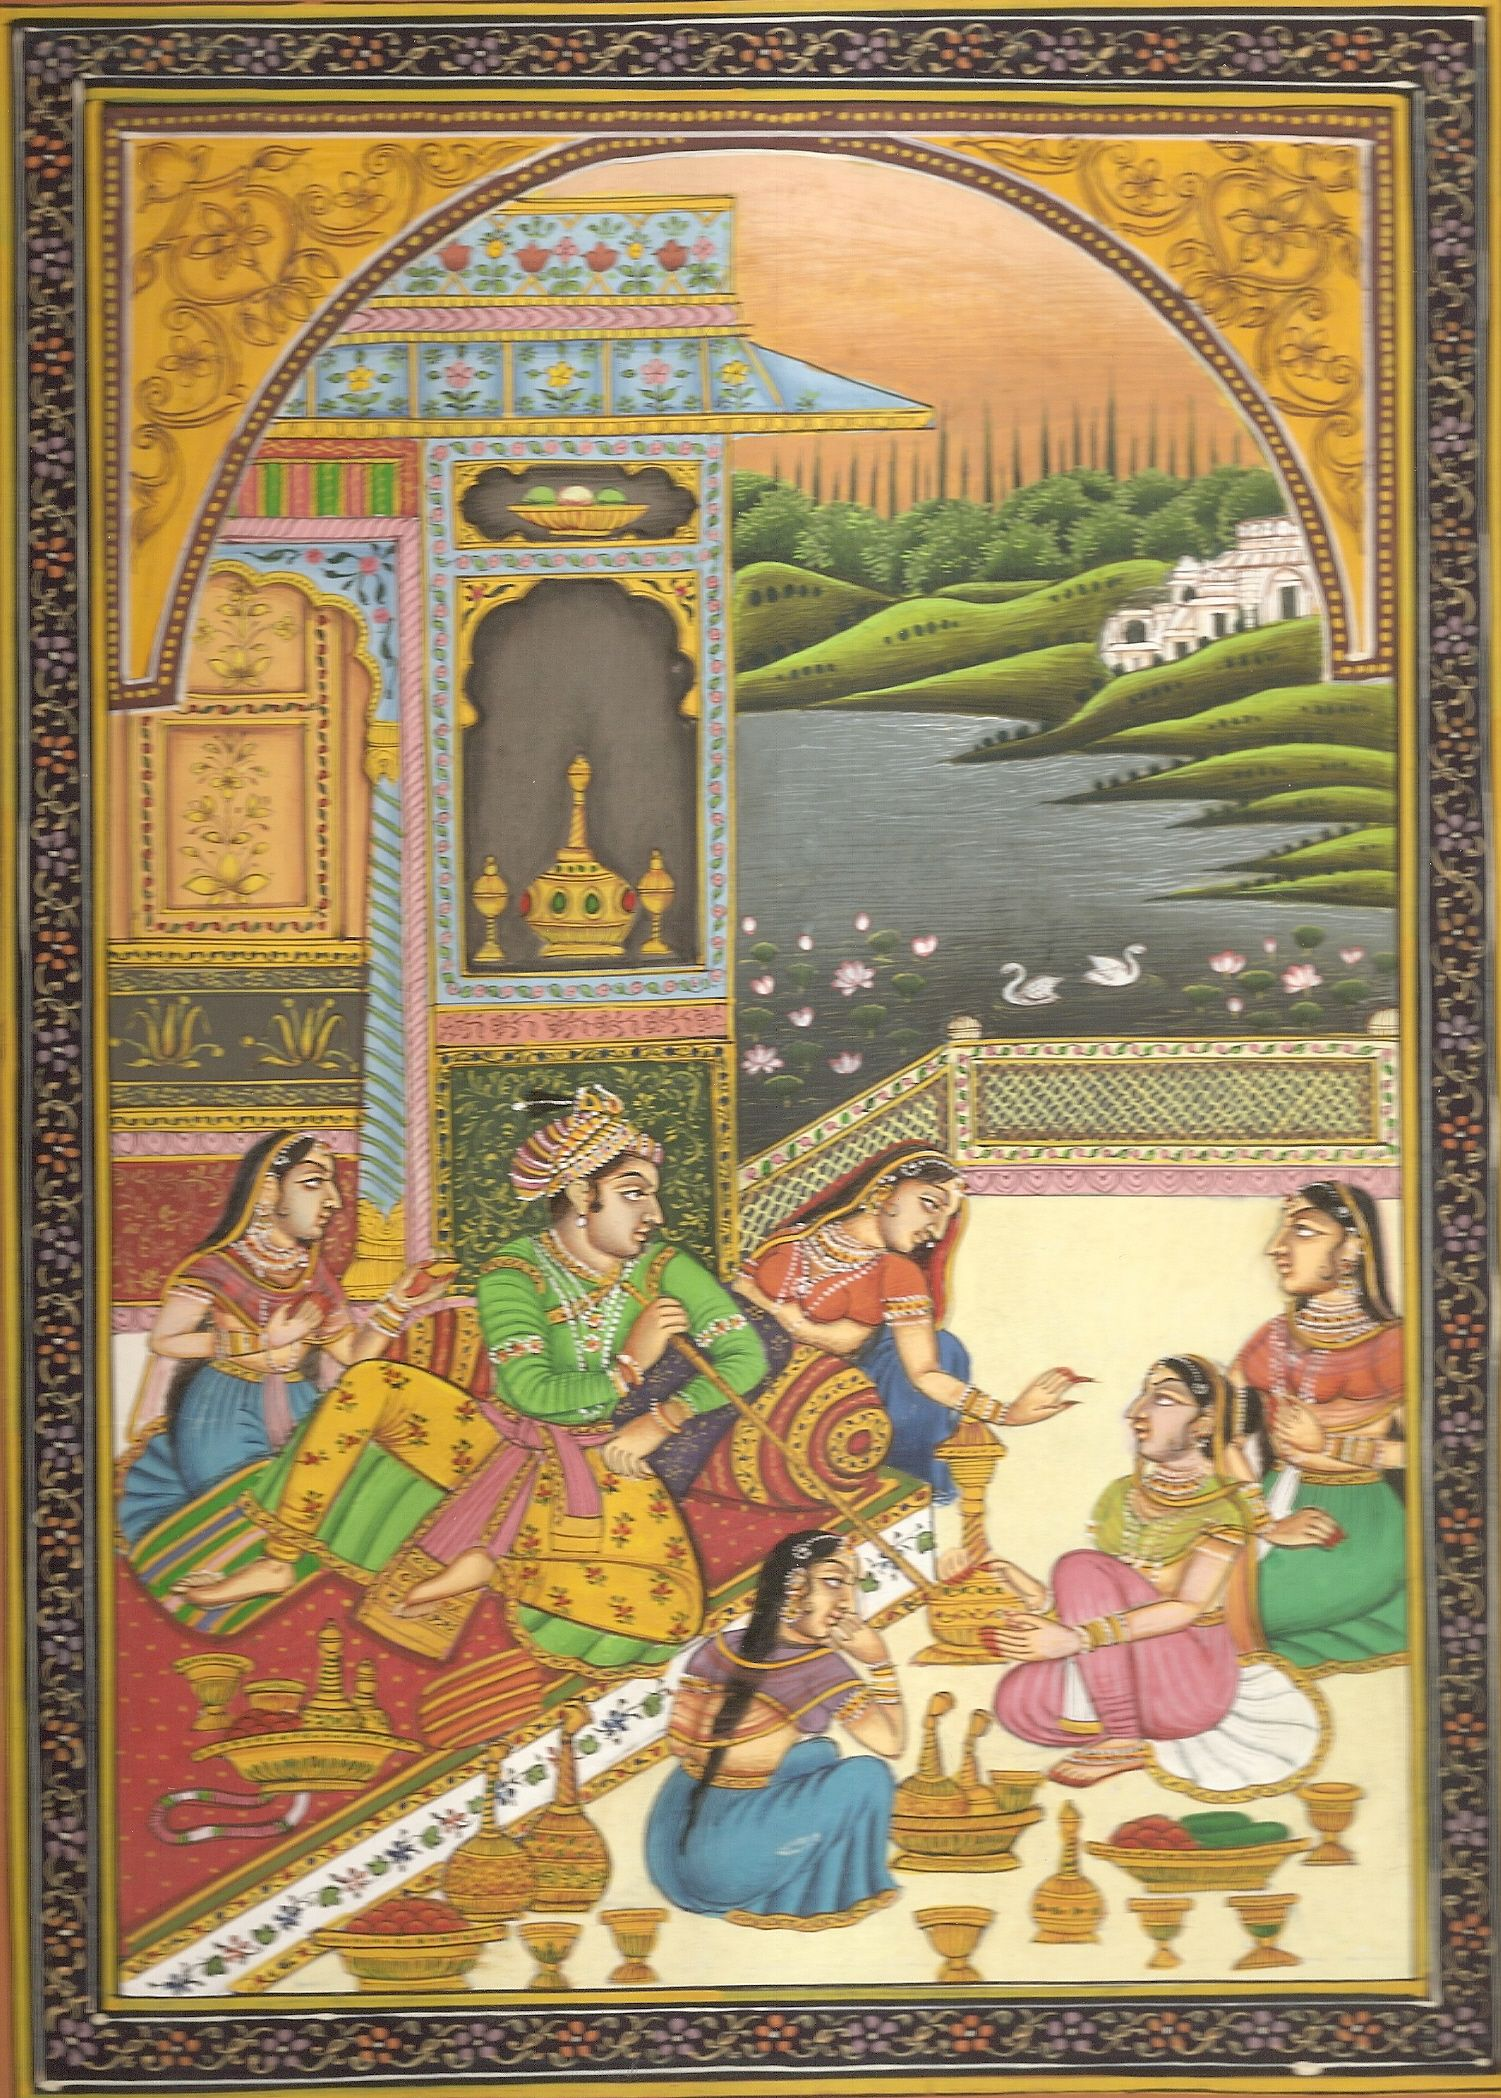 Mughal Indian Miniature Painting   Mughal paintings, Miniature painting,  Painting